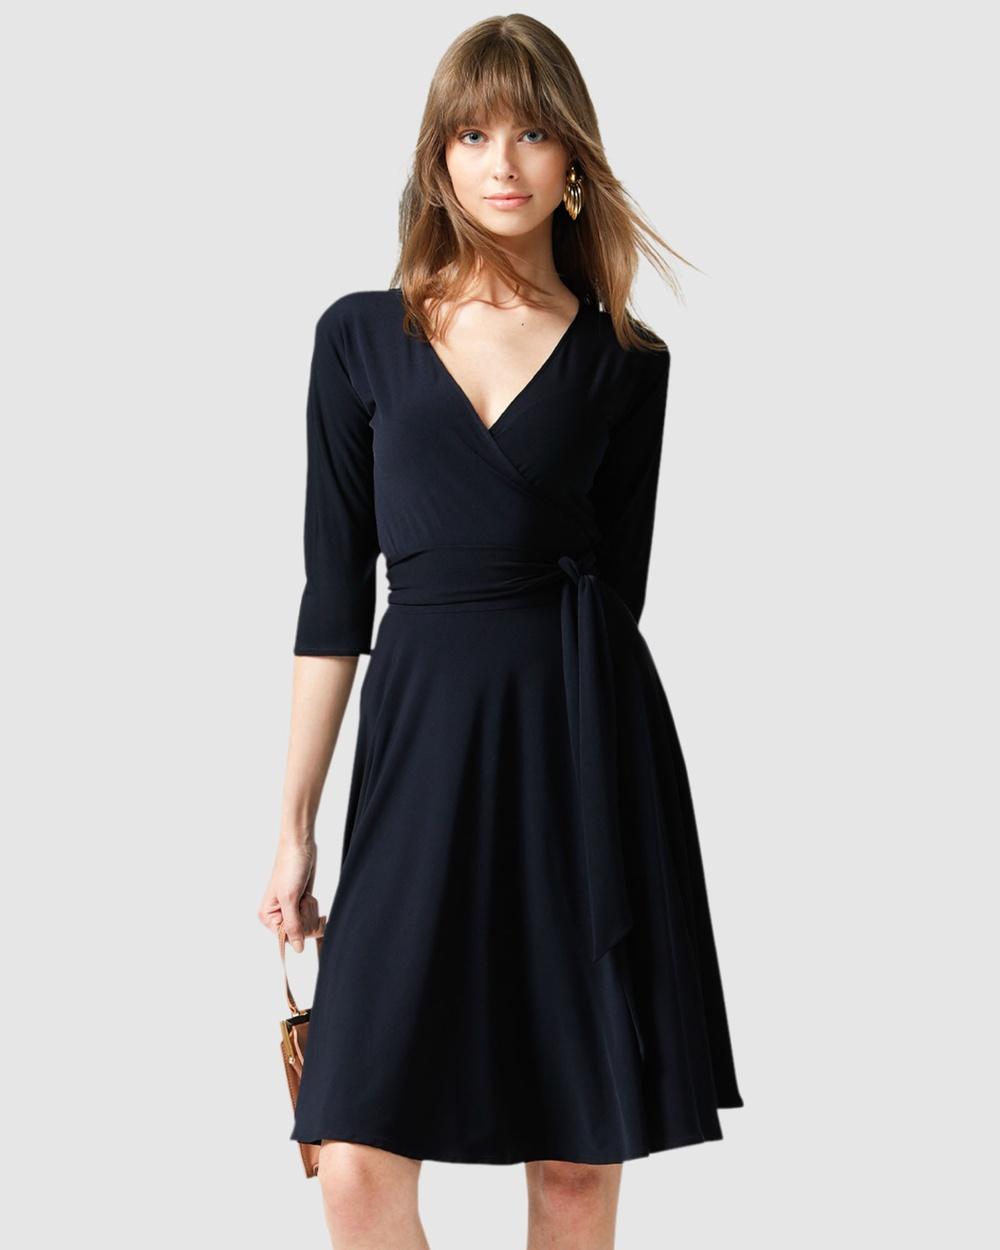 Buy SACHA DRAKE Navy Reverse Wrap Dress -  shop SACHA DRAKE dresses online